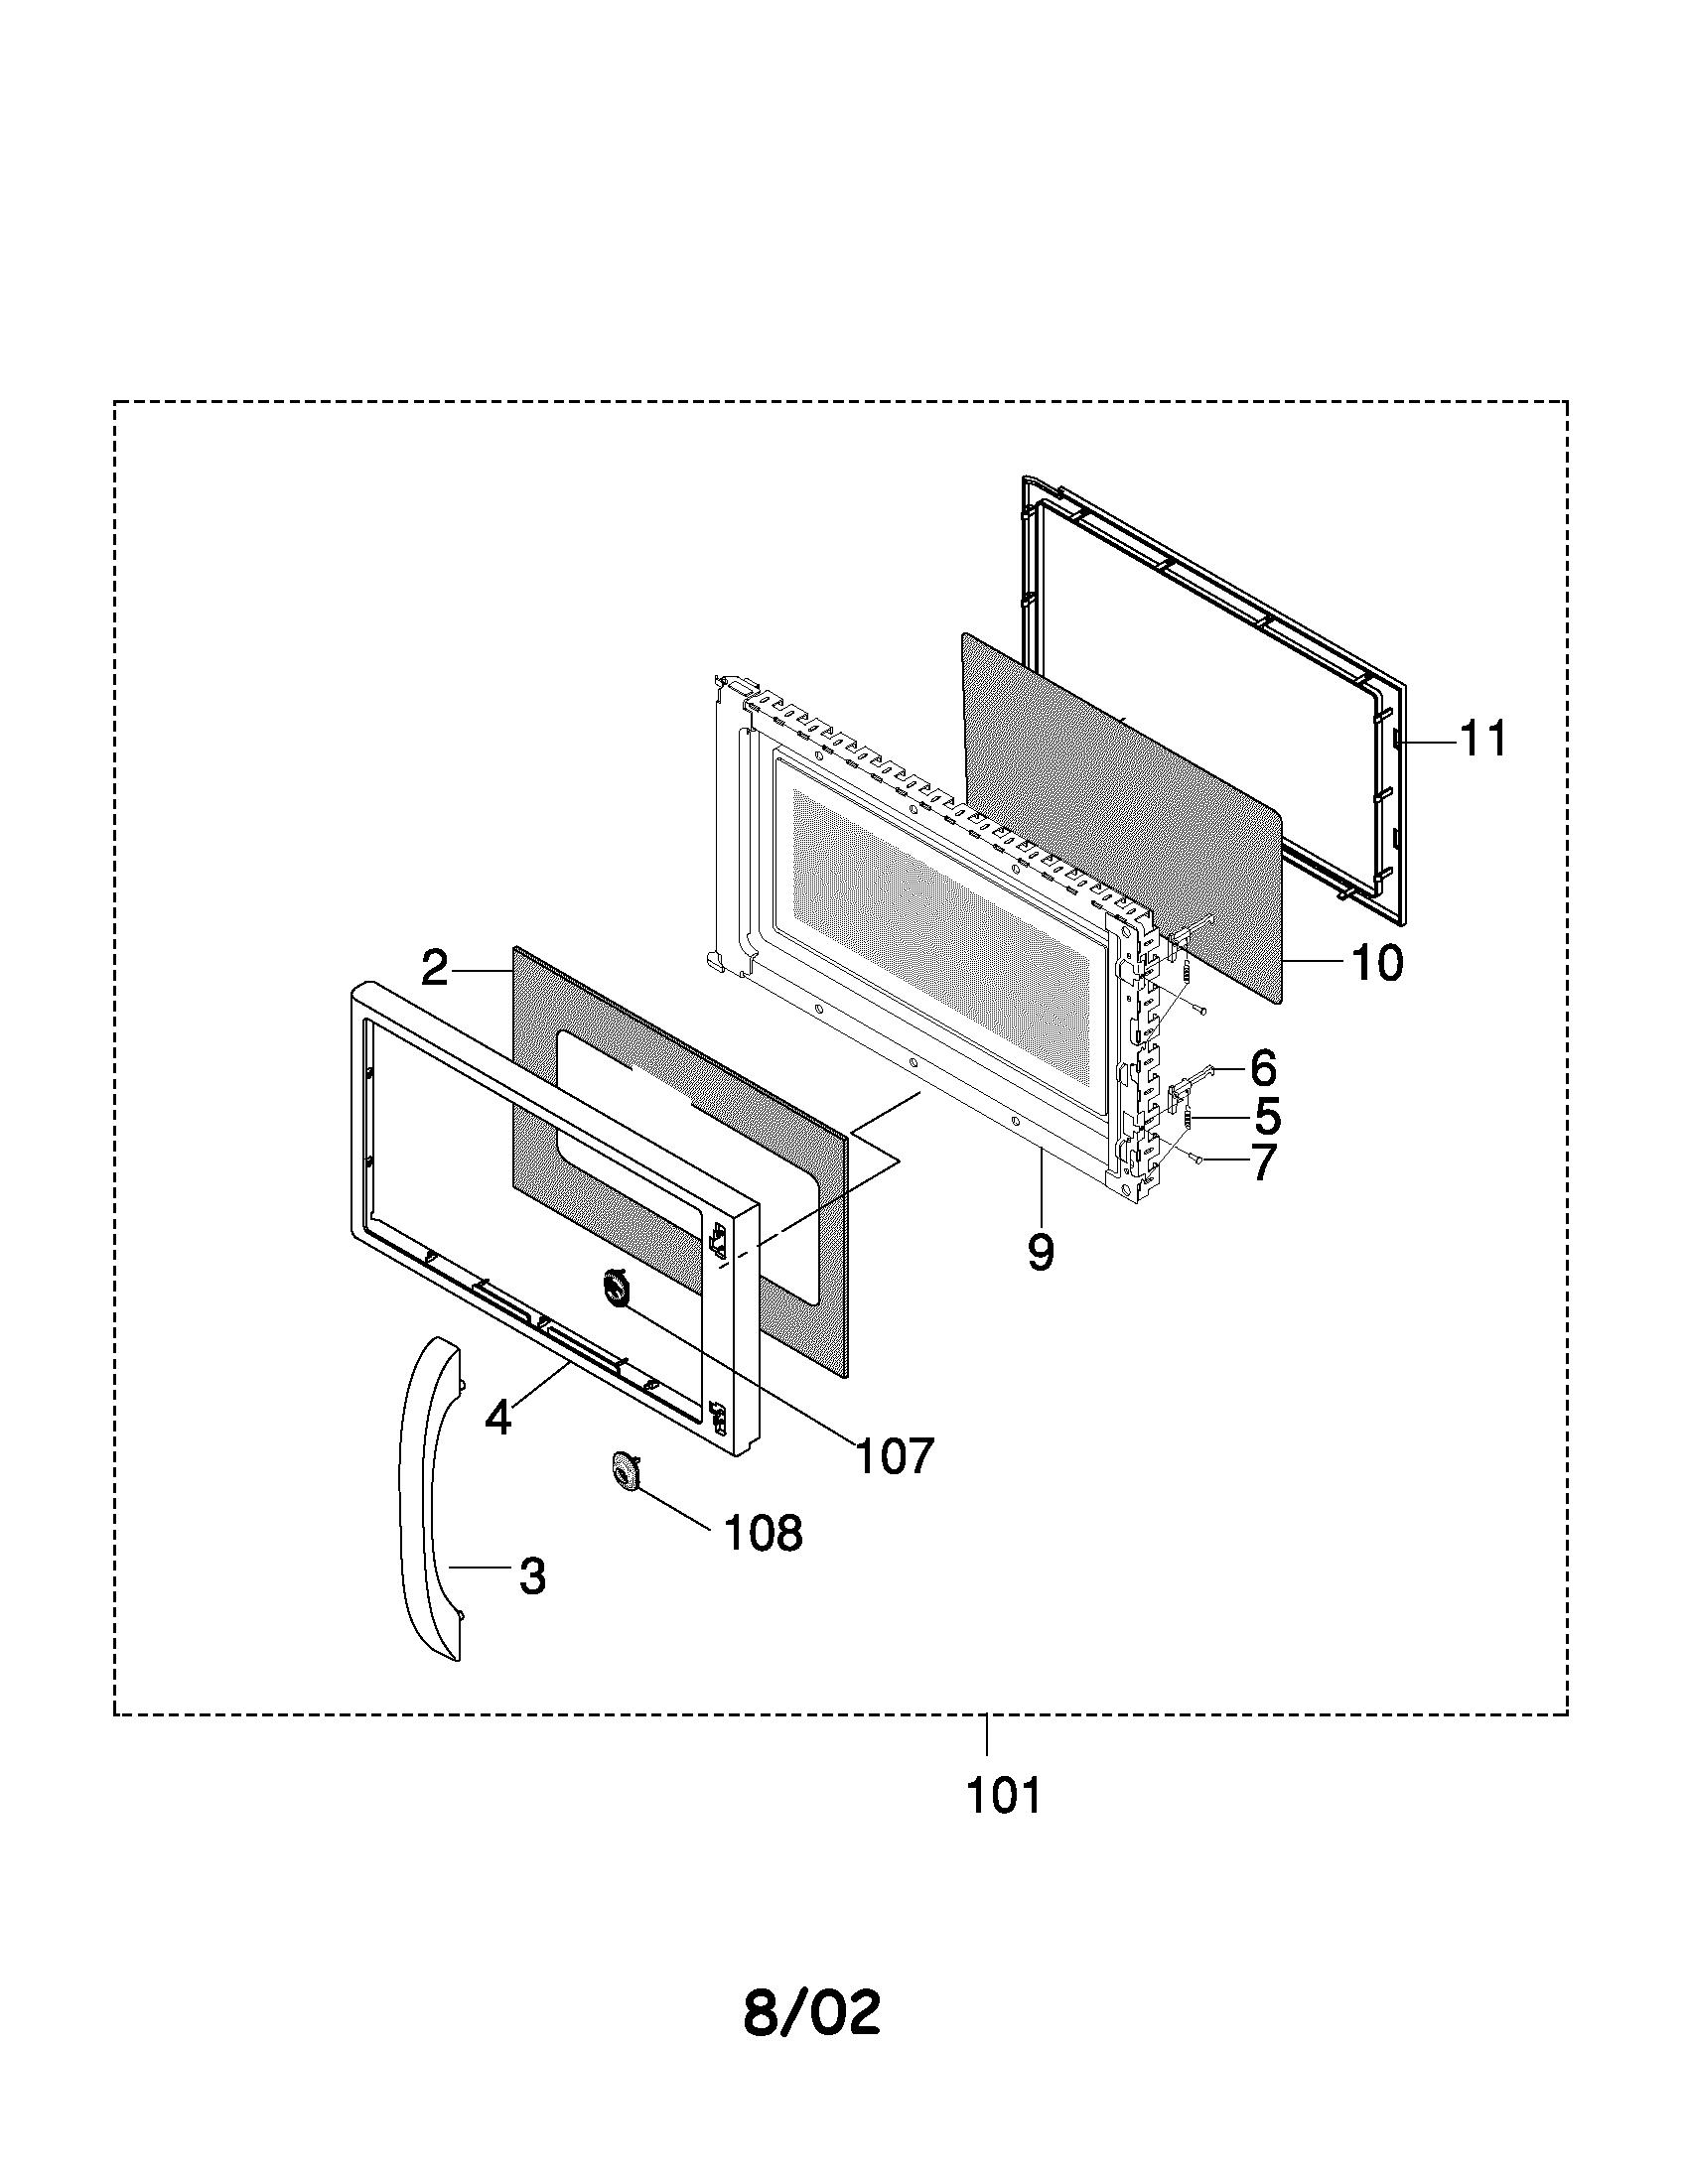 Frigidaire Parts Microwave